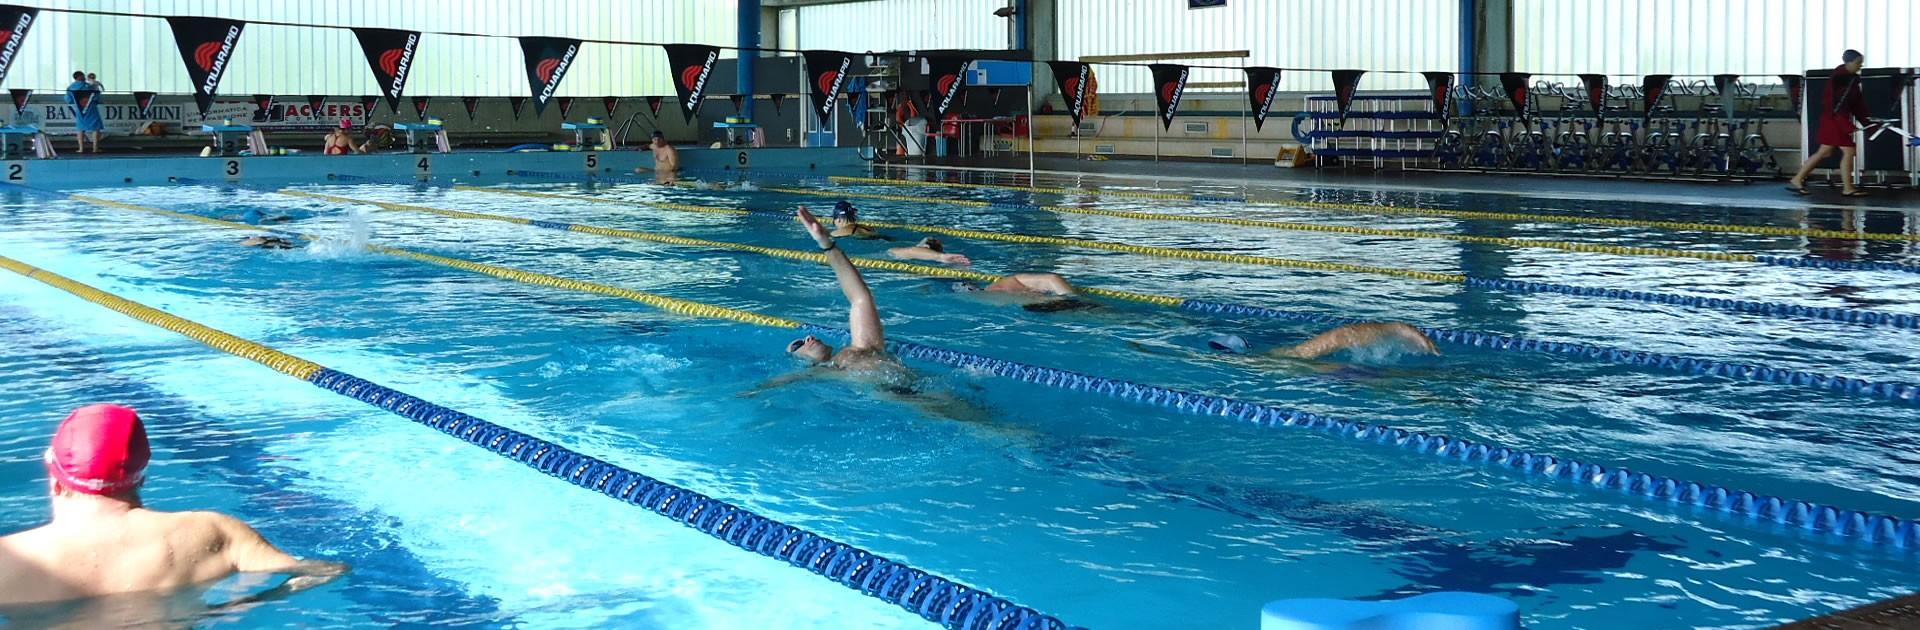 slide-corsi-di-nuoto-rimini